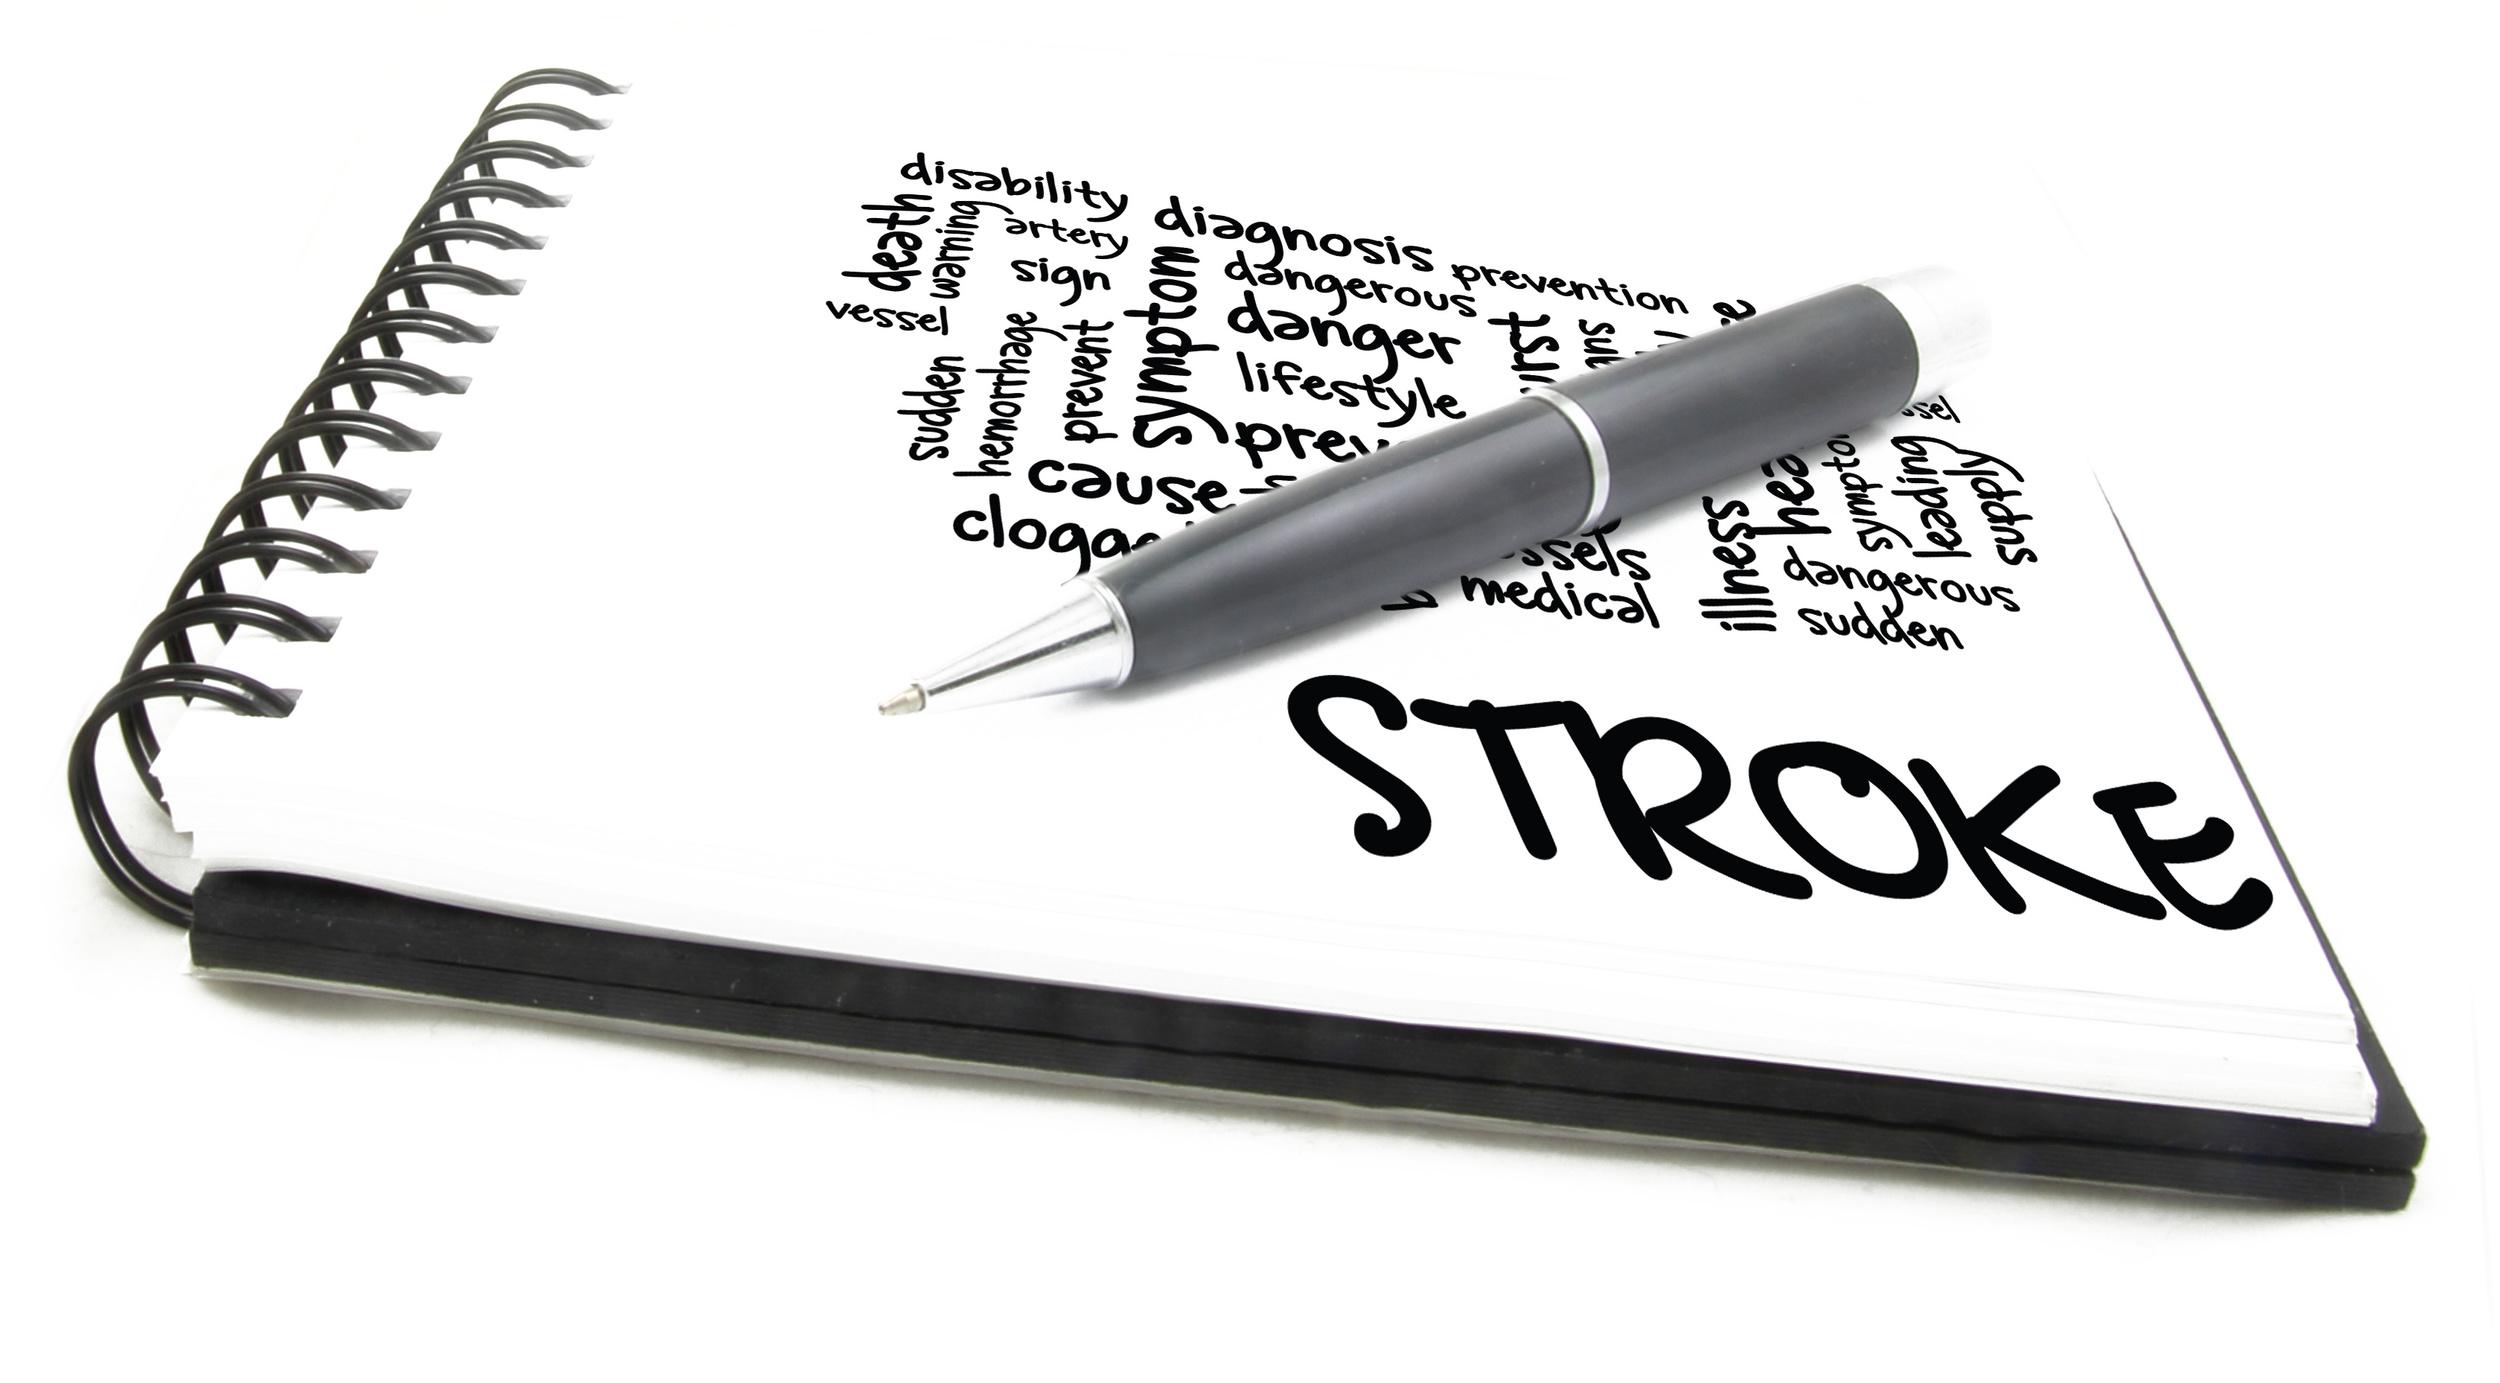 Stroke is a big challenge - neurofeedback gives hope